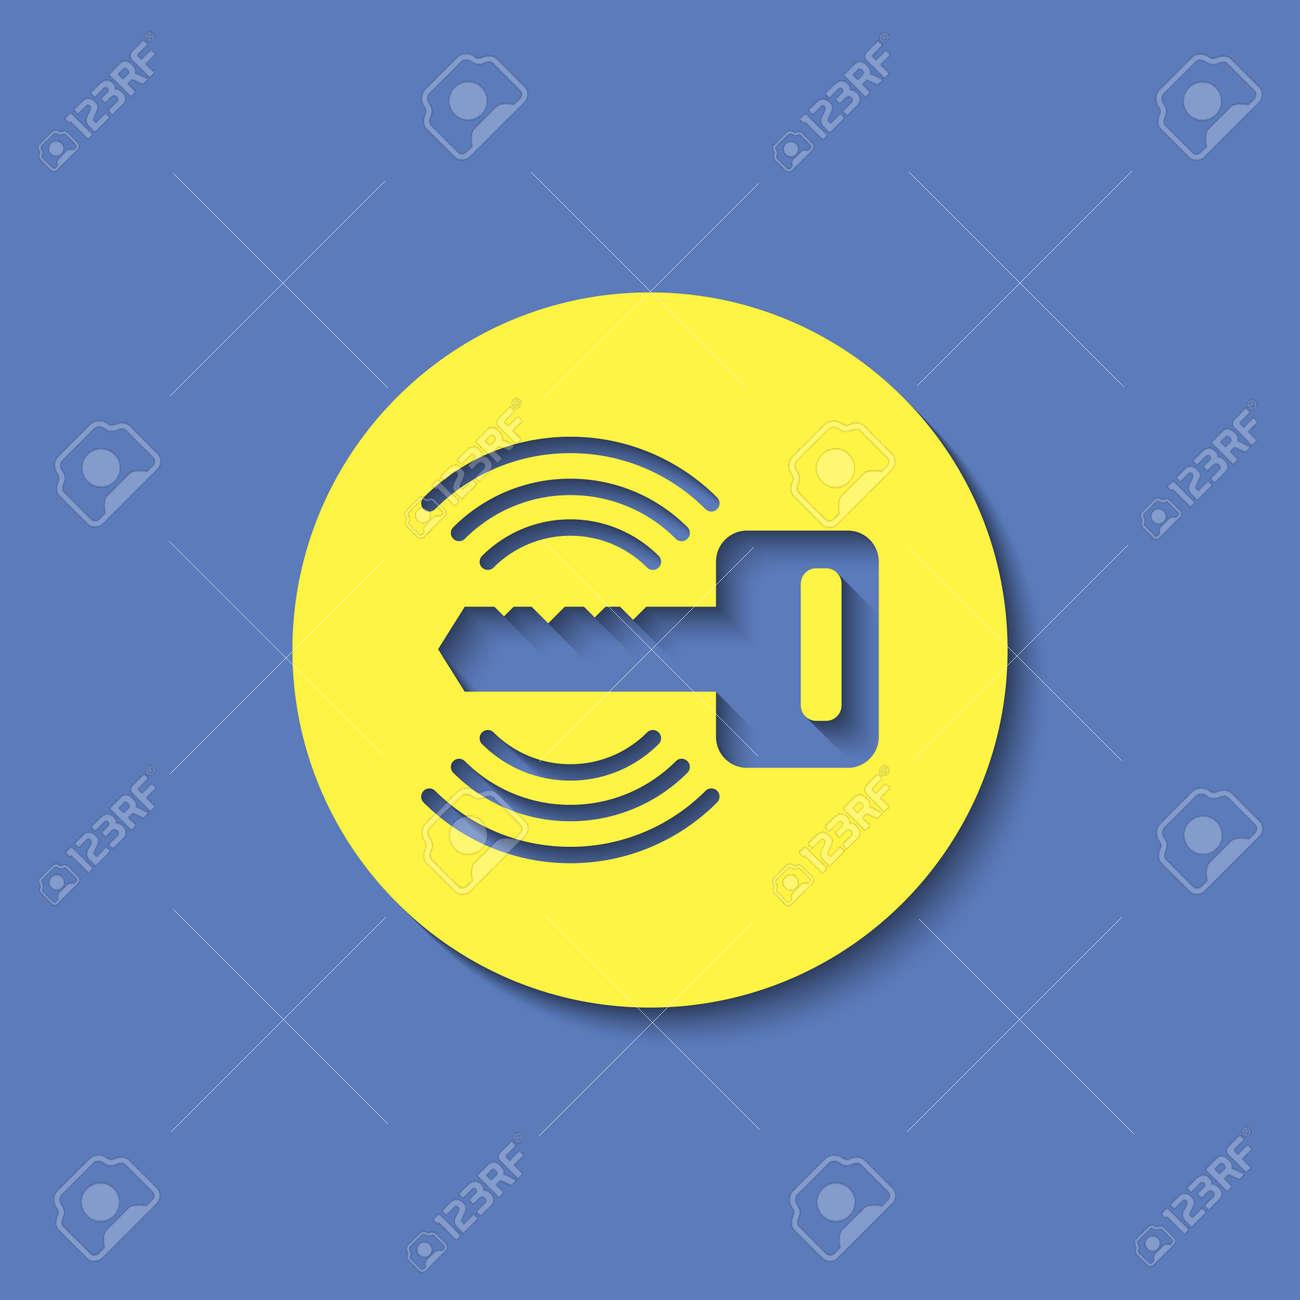 Car Remote Key Symbol Vector Hmi Dashboard Flat Icon Royalty Free - Car image sign of dashboardcar dashboard icons stock images royaltyfree imagesvectors